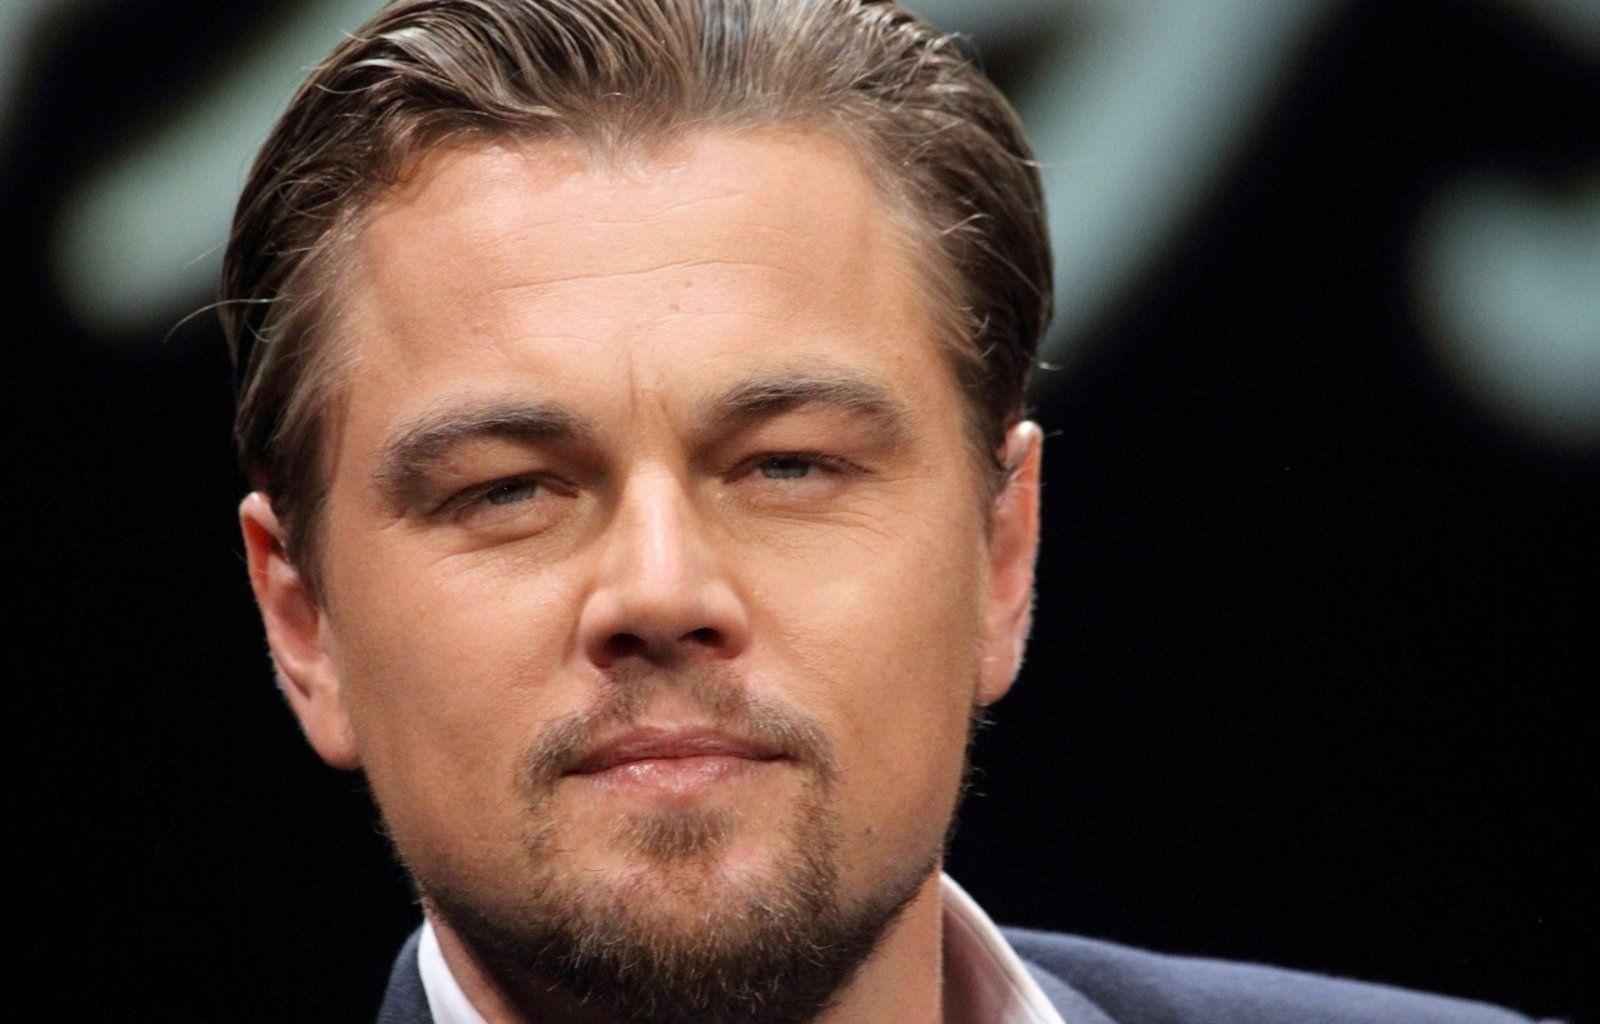 Leonardo Dicaprio Donates 1 Million To Help Protect Elephants From